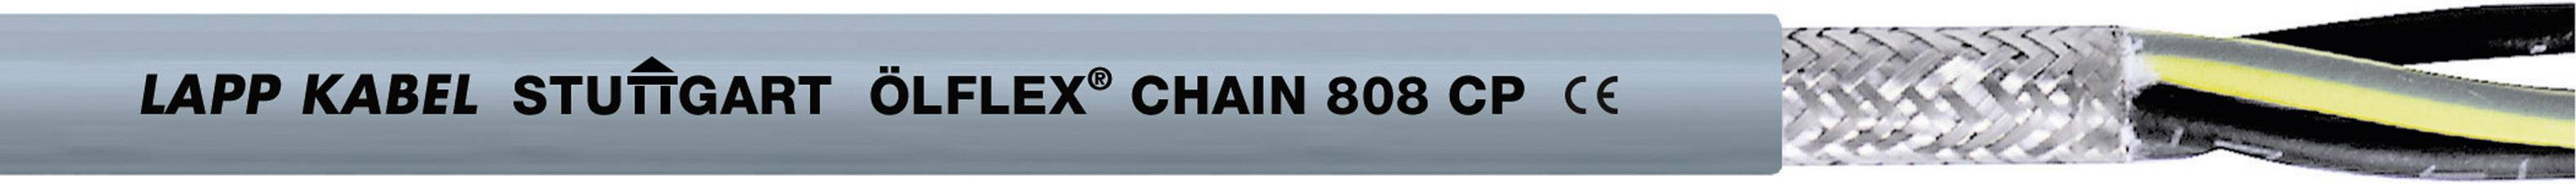 Žíla kabelu LappKabel ÖLFLEX CHAIN 808 CP 5G0,5 (1027754), 5x 0,5 mm², polyurethan, Ø 7,1 mm, stíněný, 100 m,